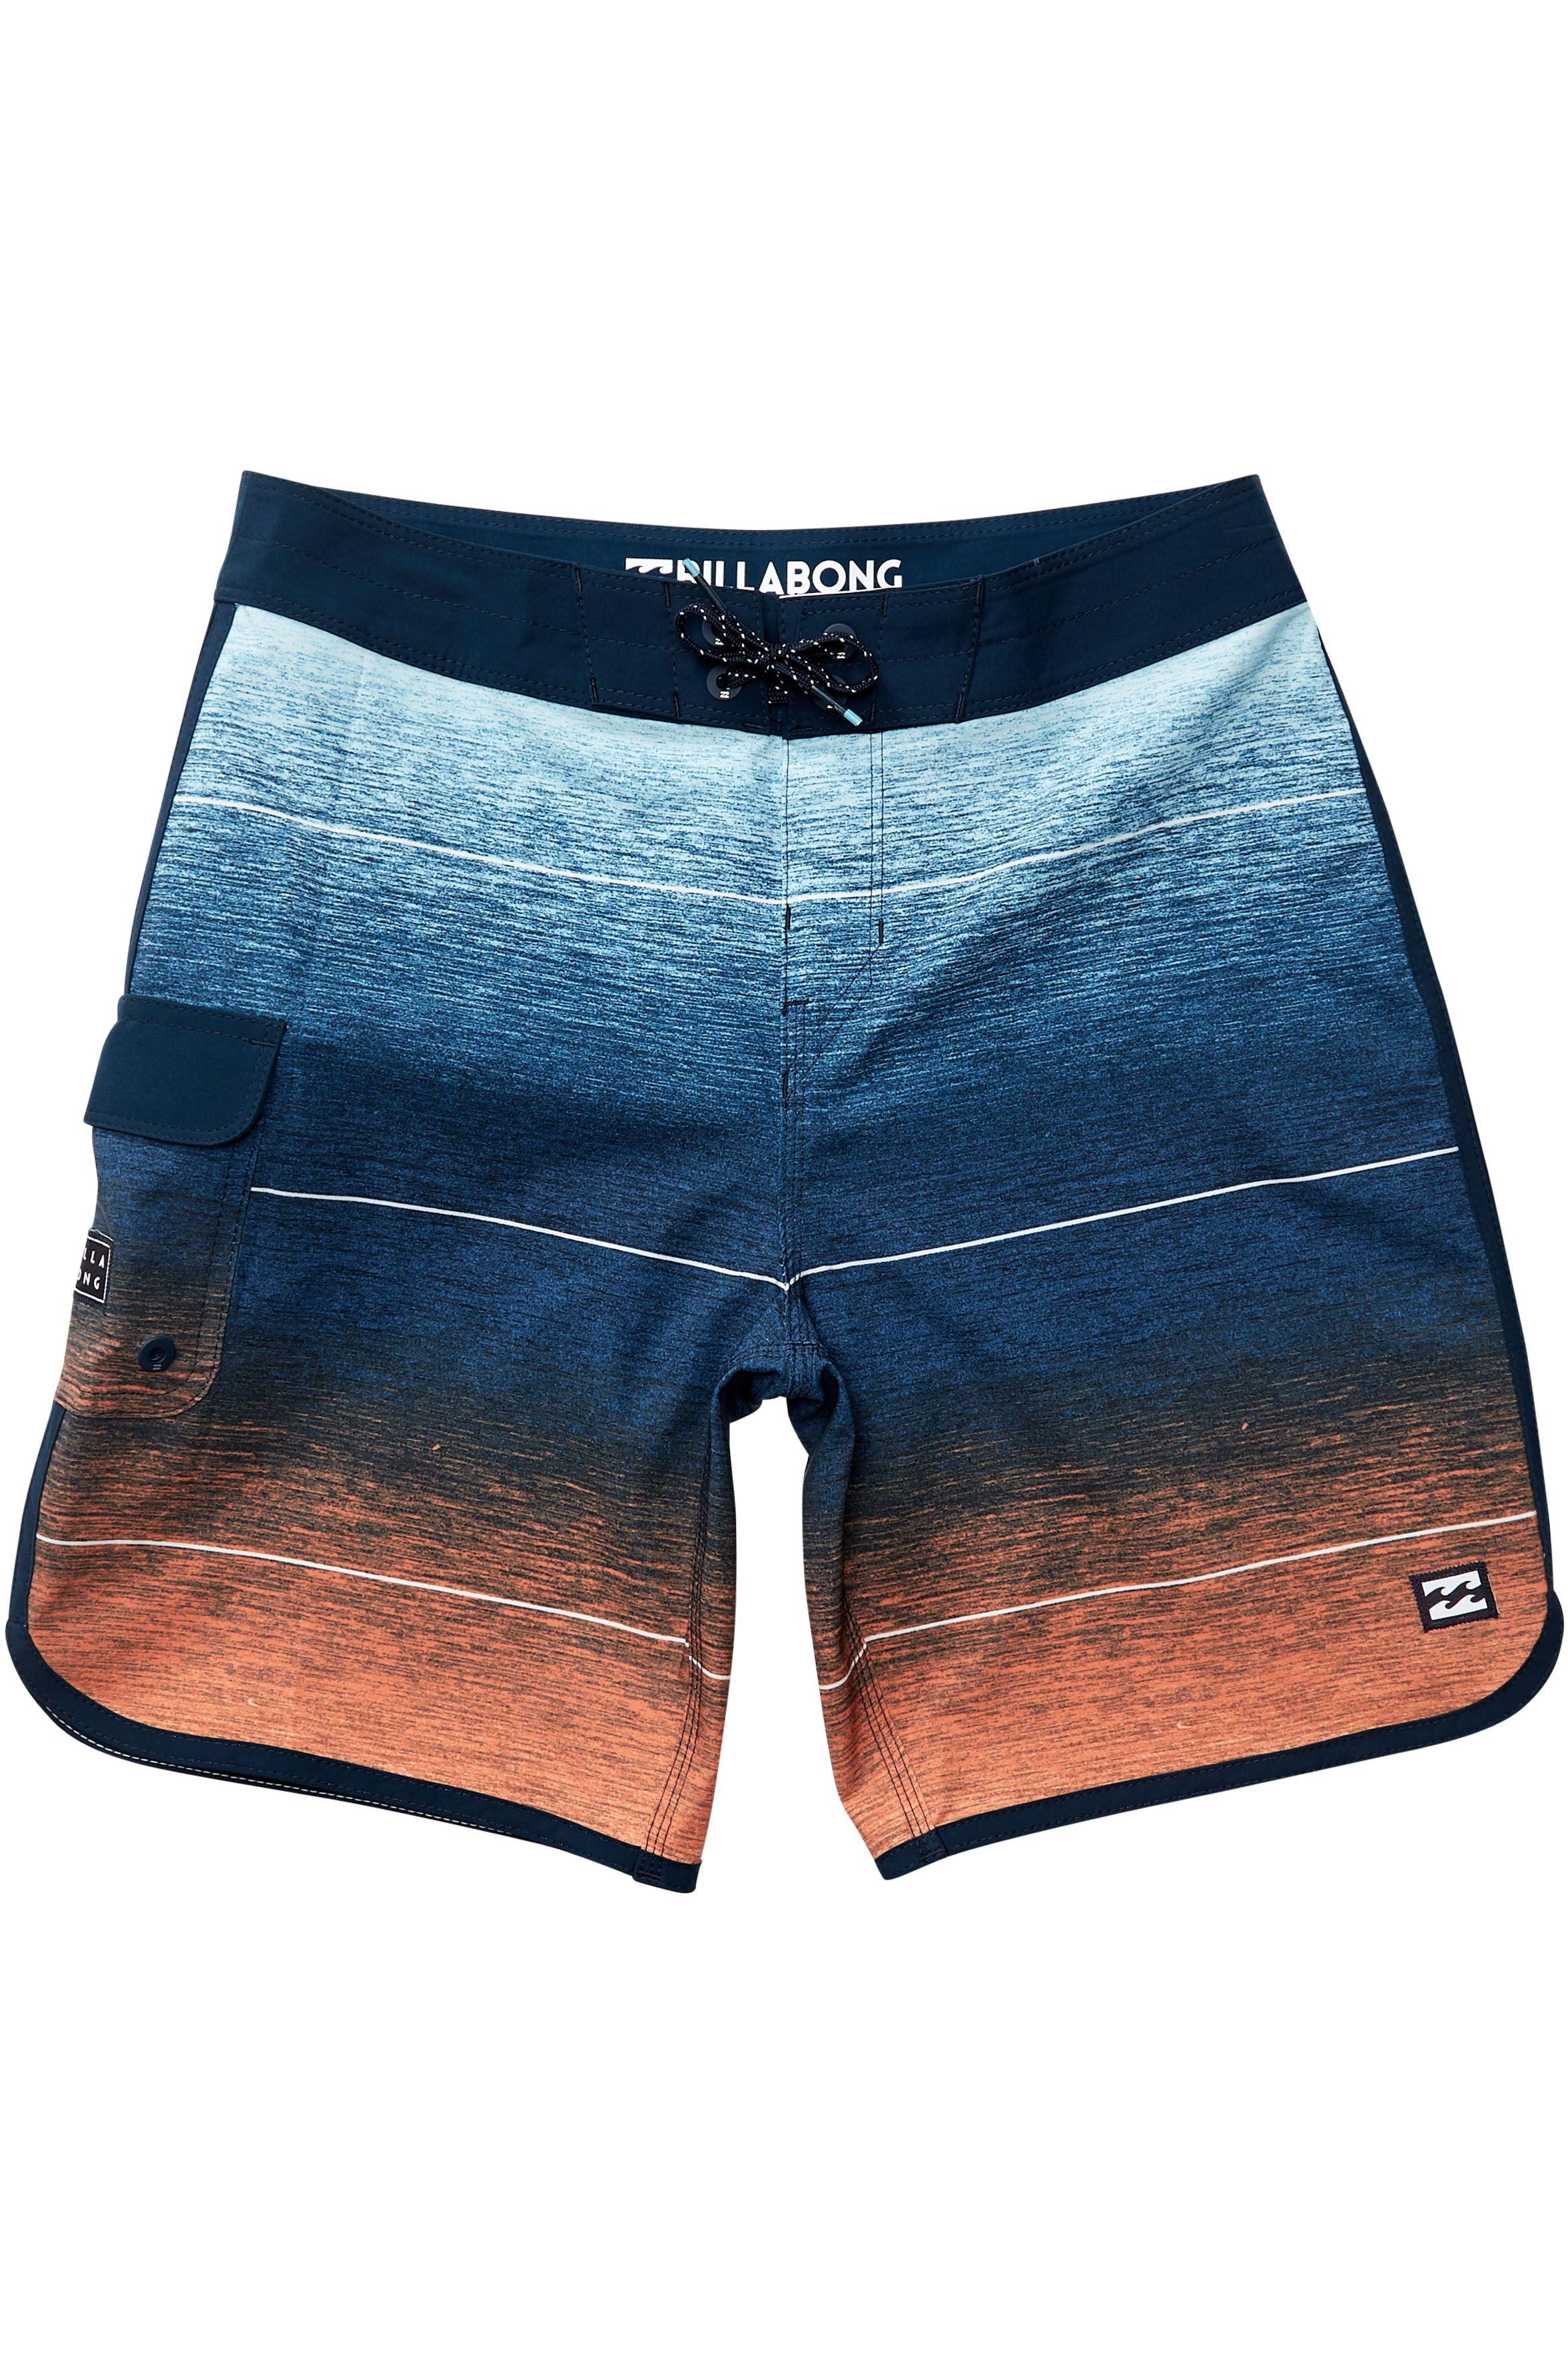 Boardshorts Billabong 73 STRIPE PRO Orange